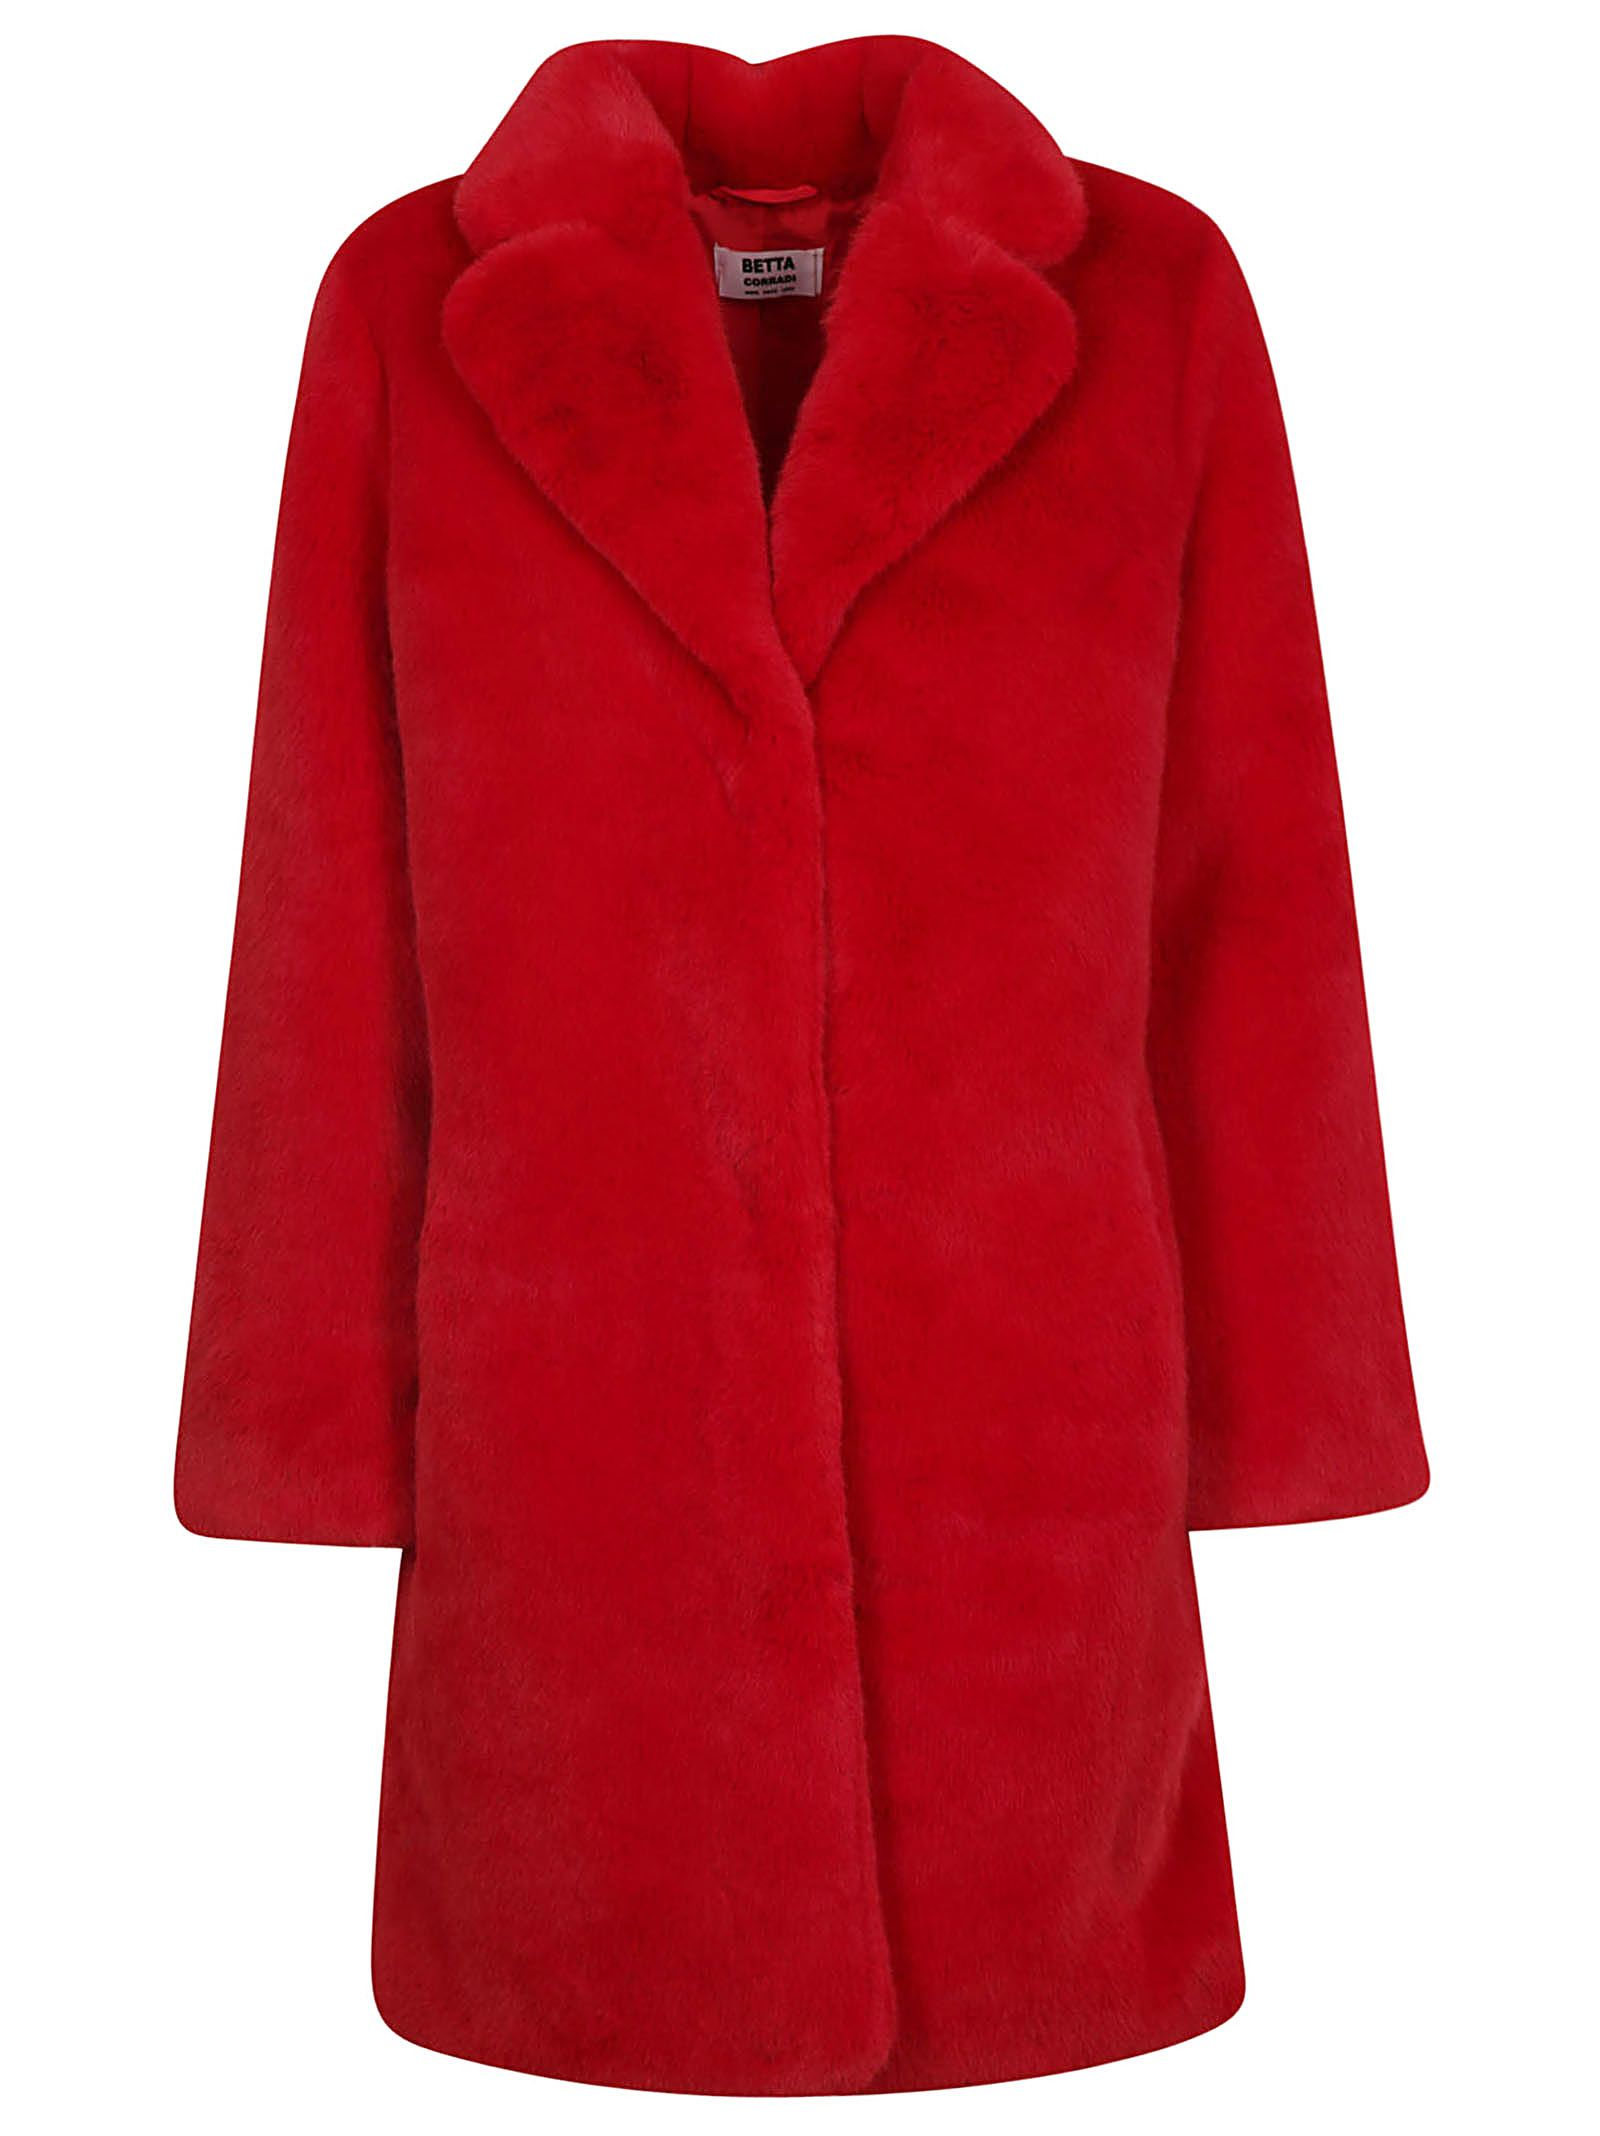 BETTA CORRADI Fur Coat in Red